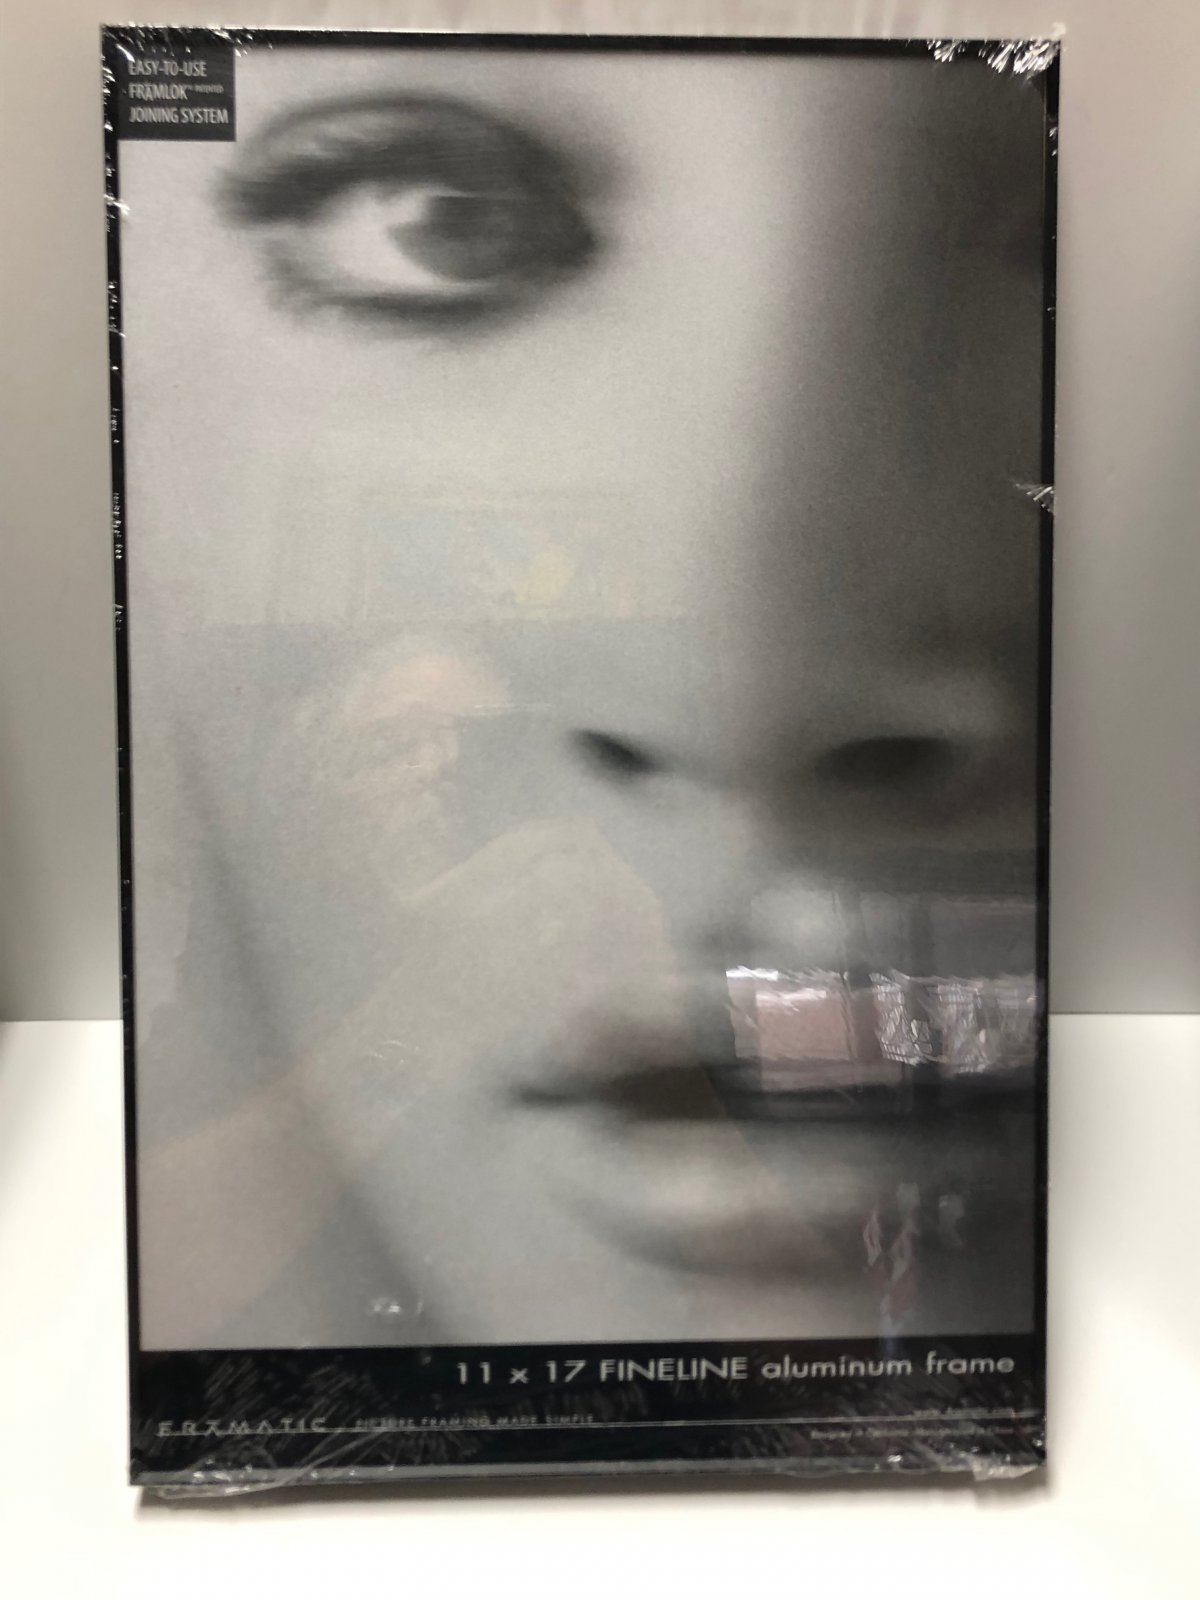 11 x 17 Framatic Fineline Metal Frame